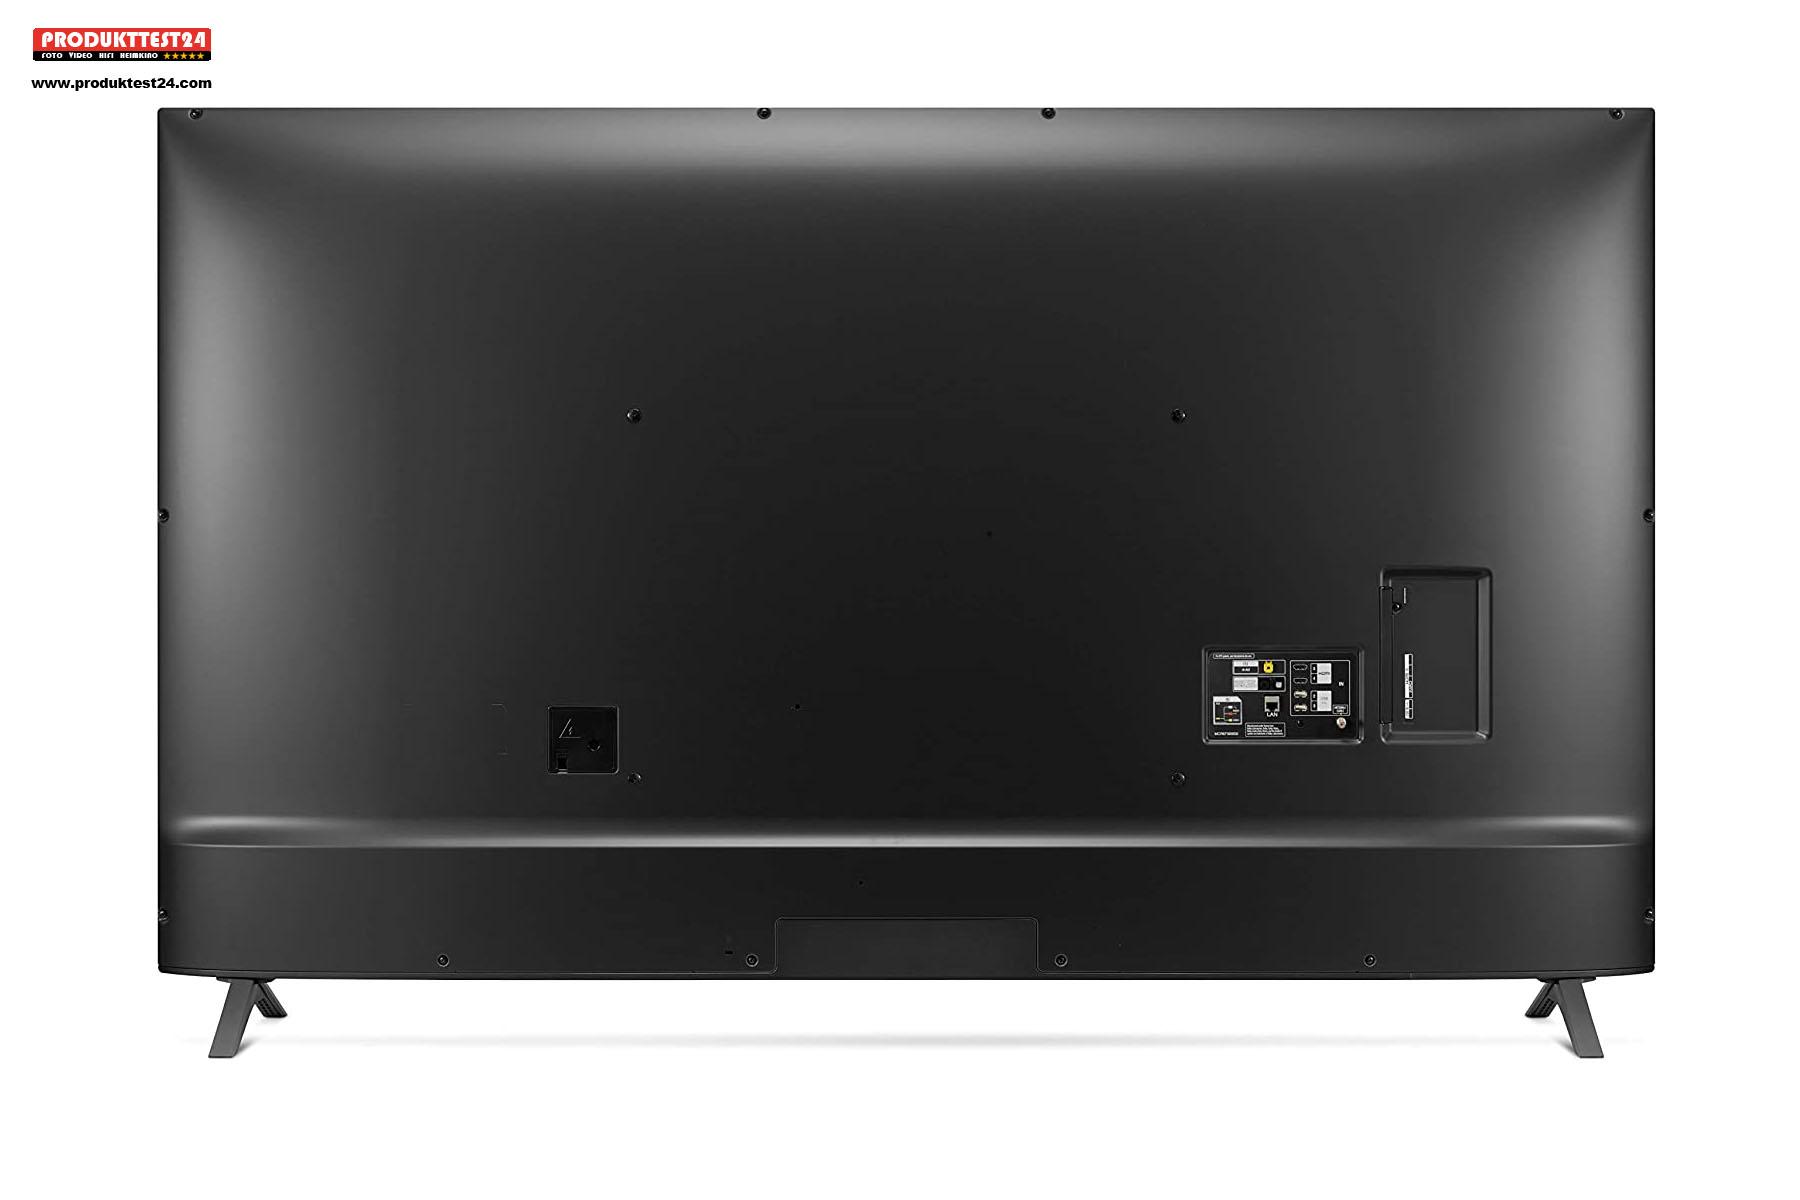 Die Rückseite des LG 75UN85006LA